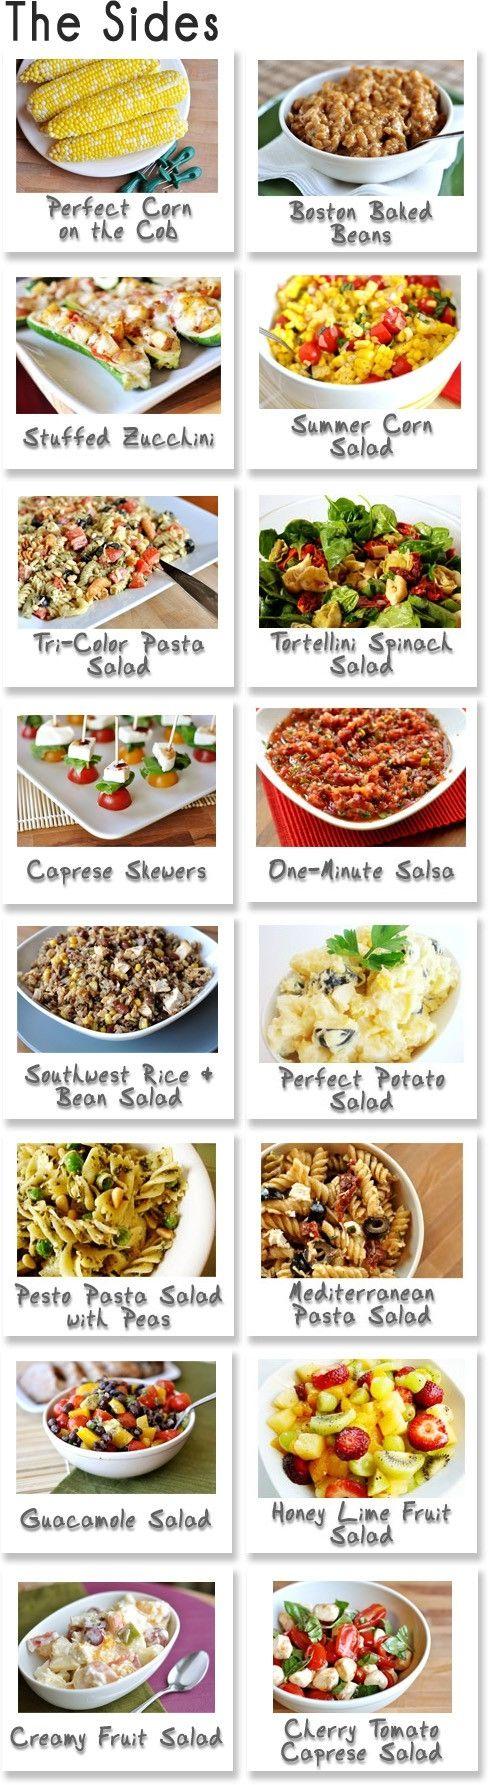 food ideas by summergirl | 4th of July | Pinterest | Food ideas ...